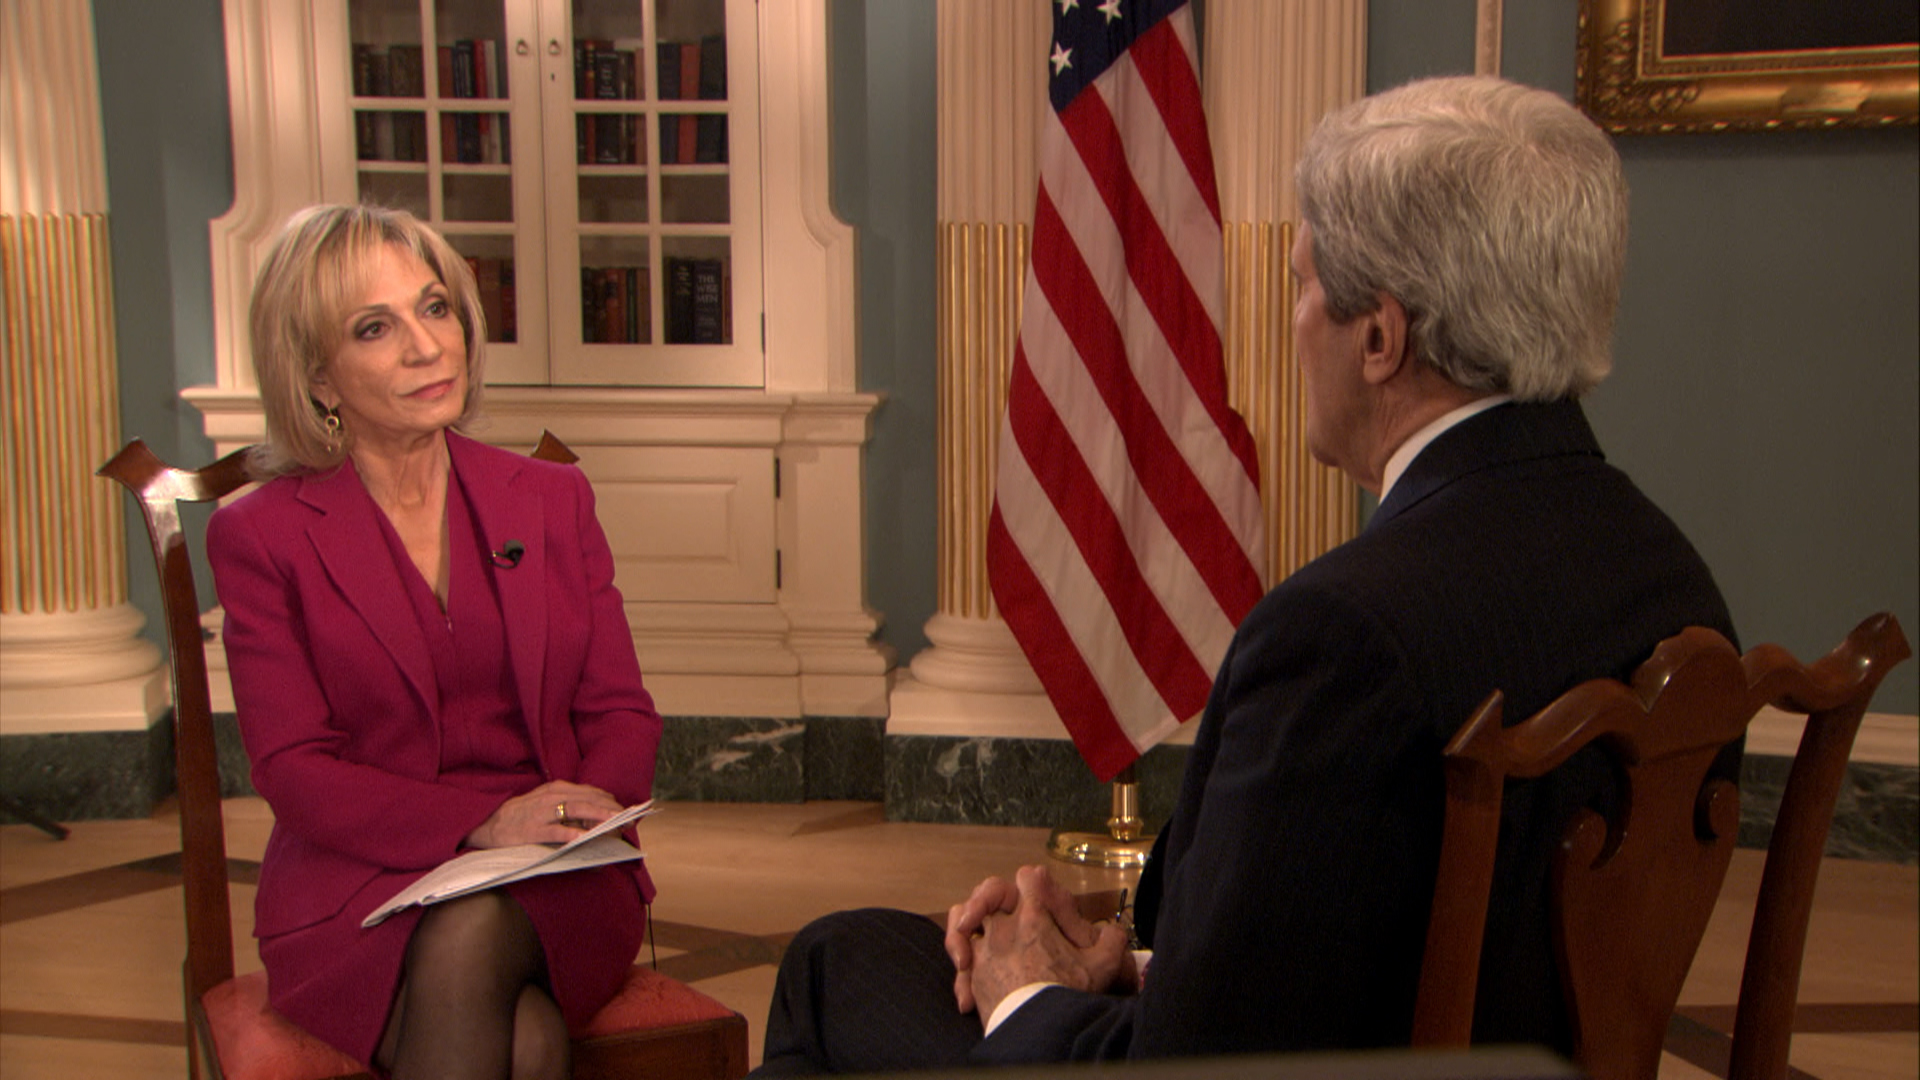 Kerry talks Keystone XL Pipeline